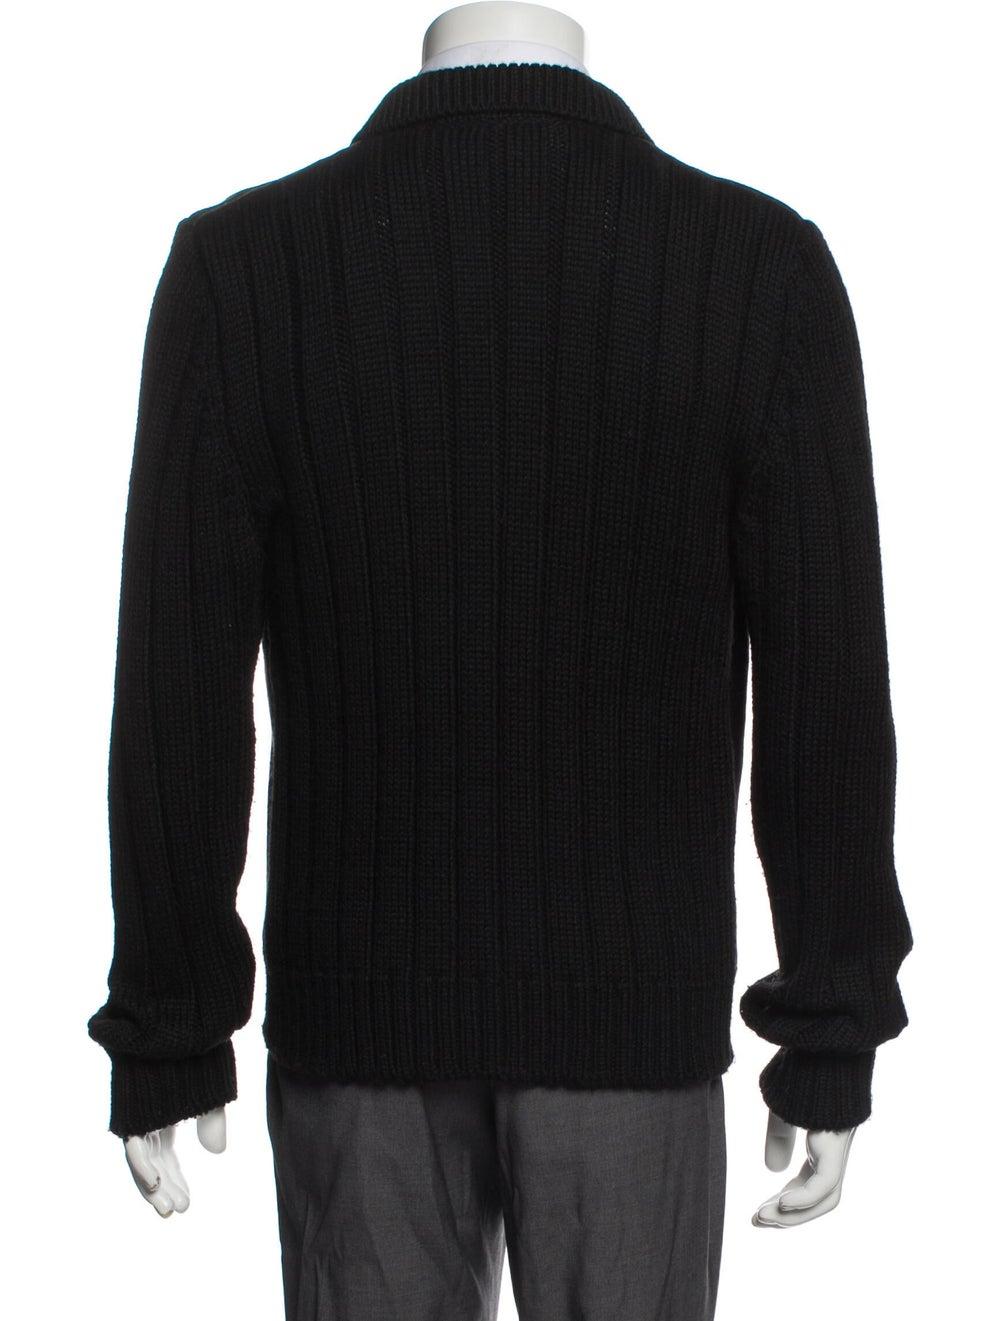 Prada Virgin Wool Mock Neck Cardigan Wool - image 3